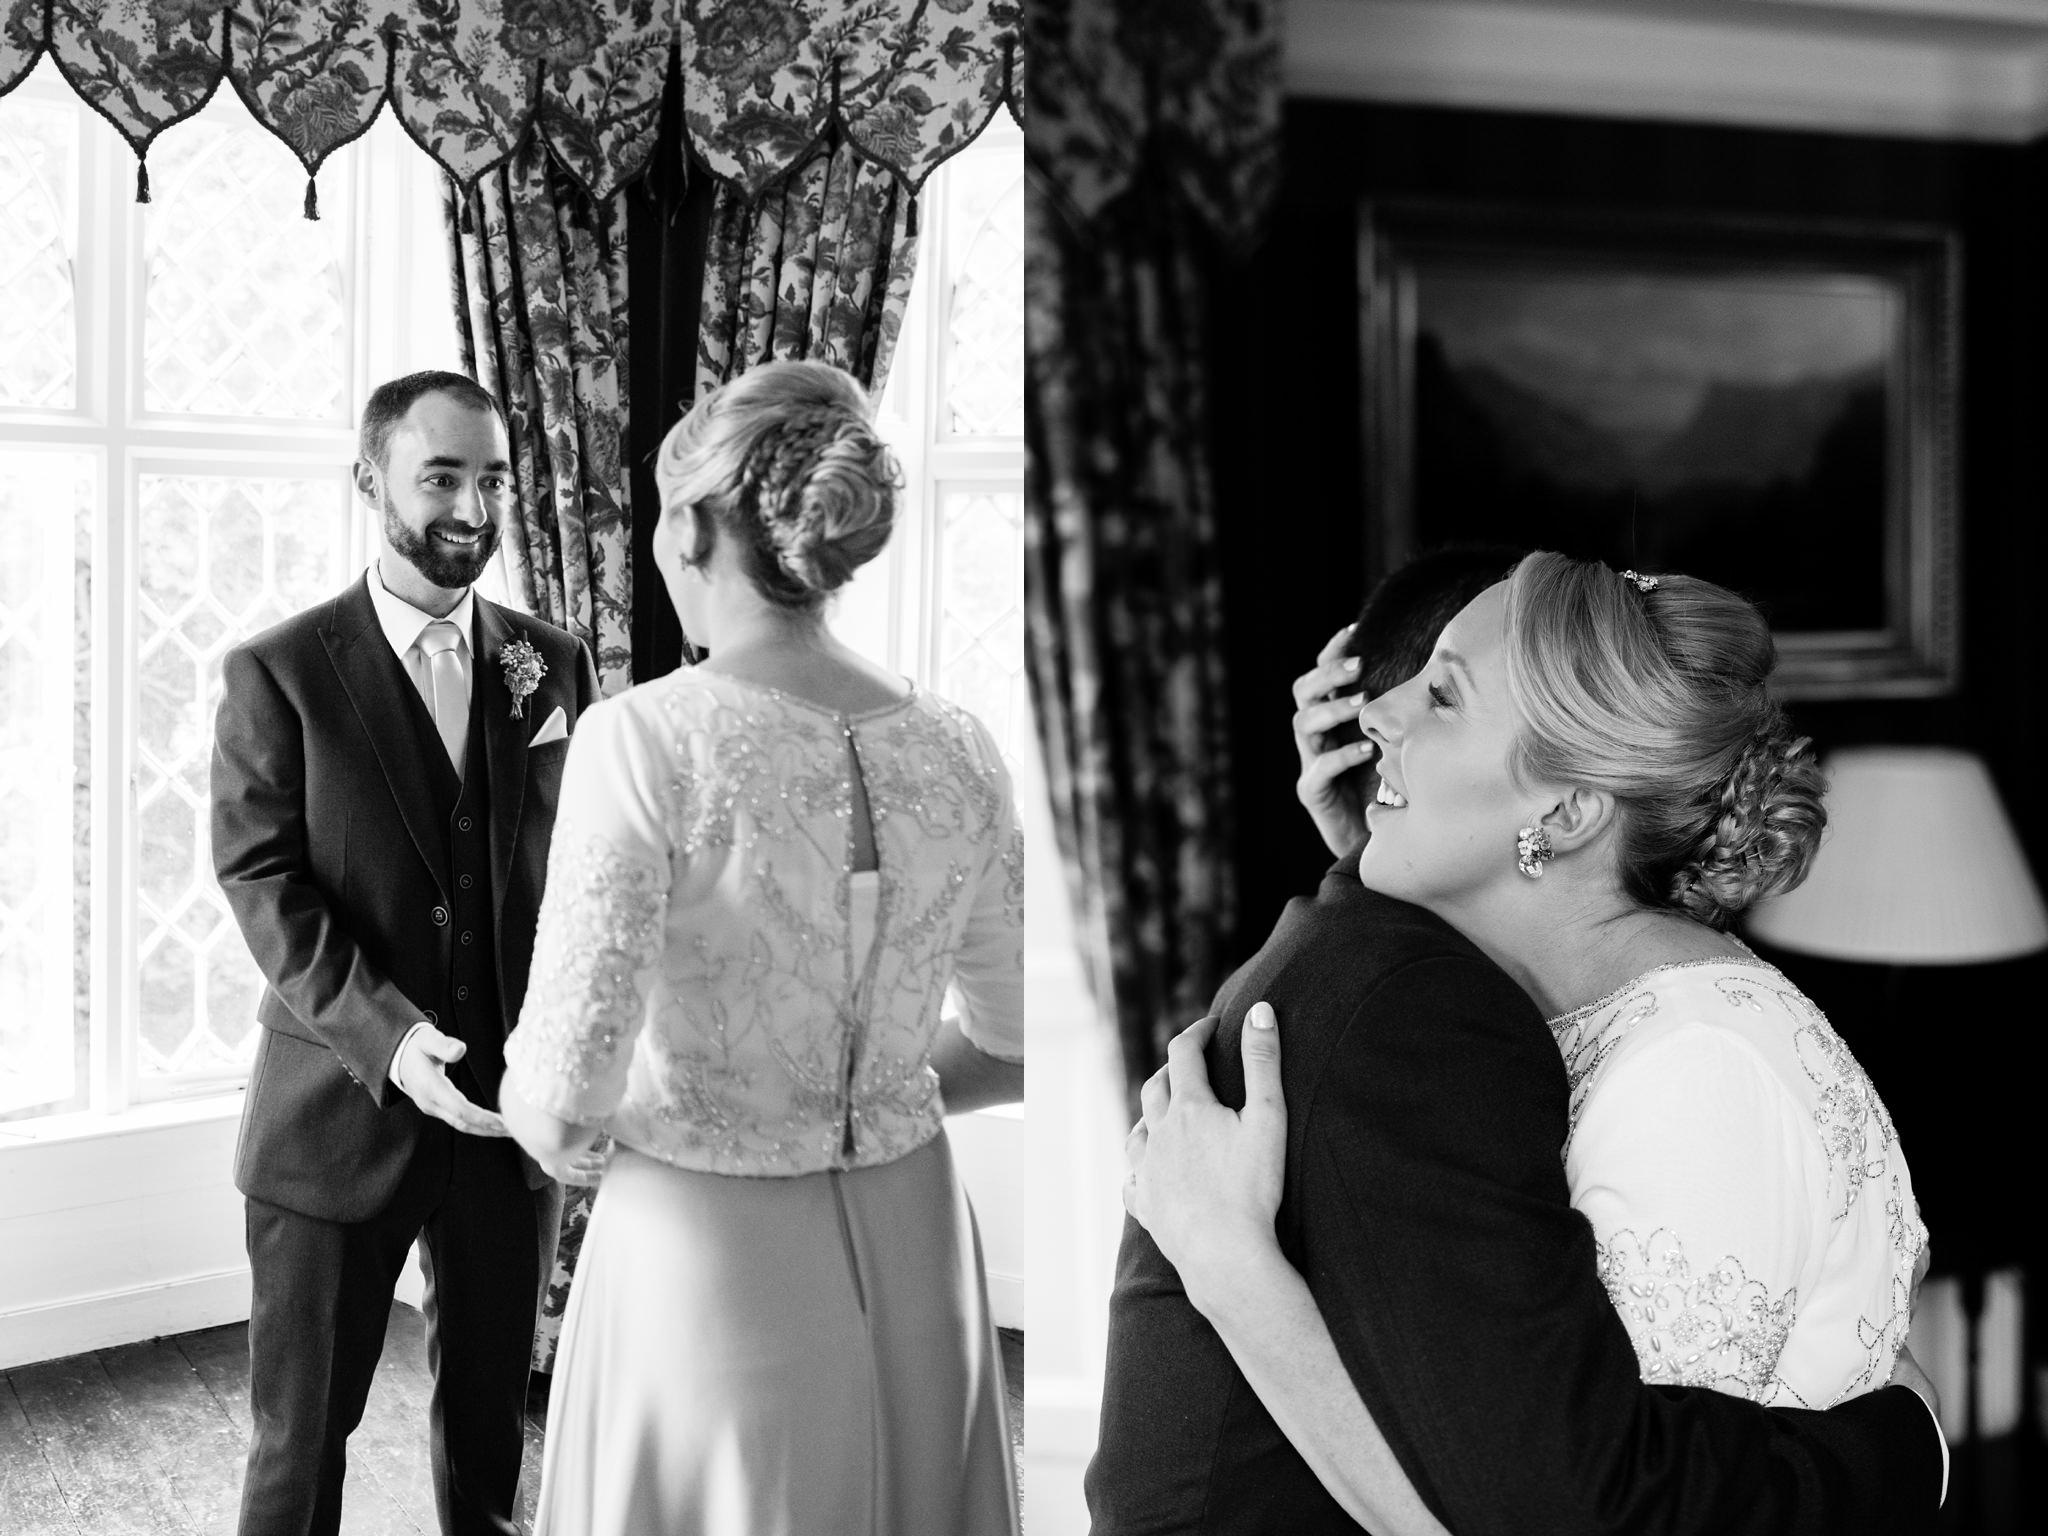 Elisha-Clarke-Photography-Dublin-City-Wedding_0061.jpg